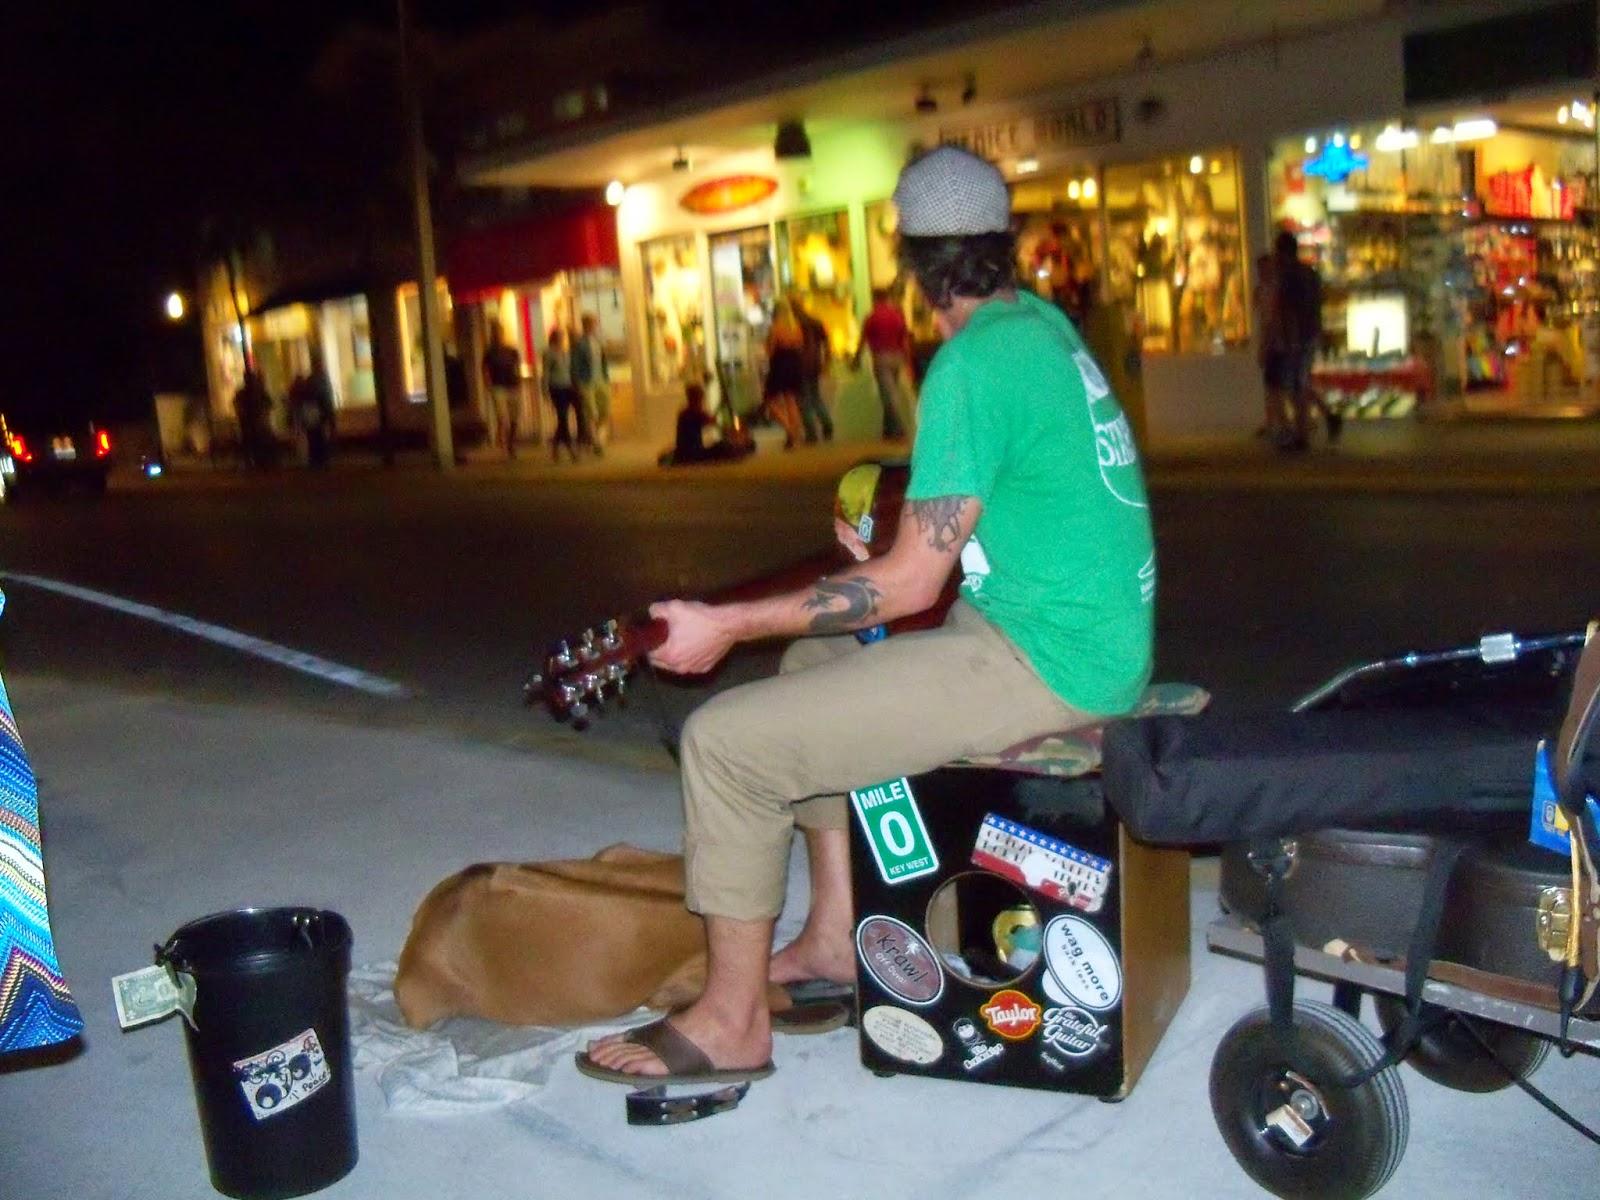 Key West Vacation - 116_5313.JPG